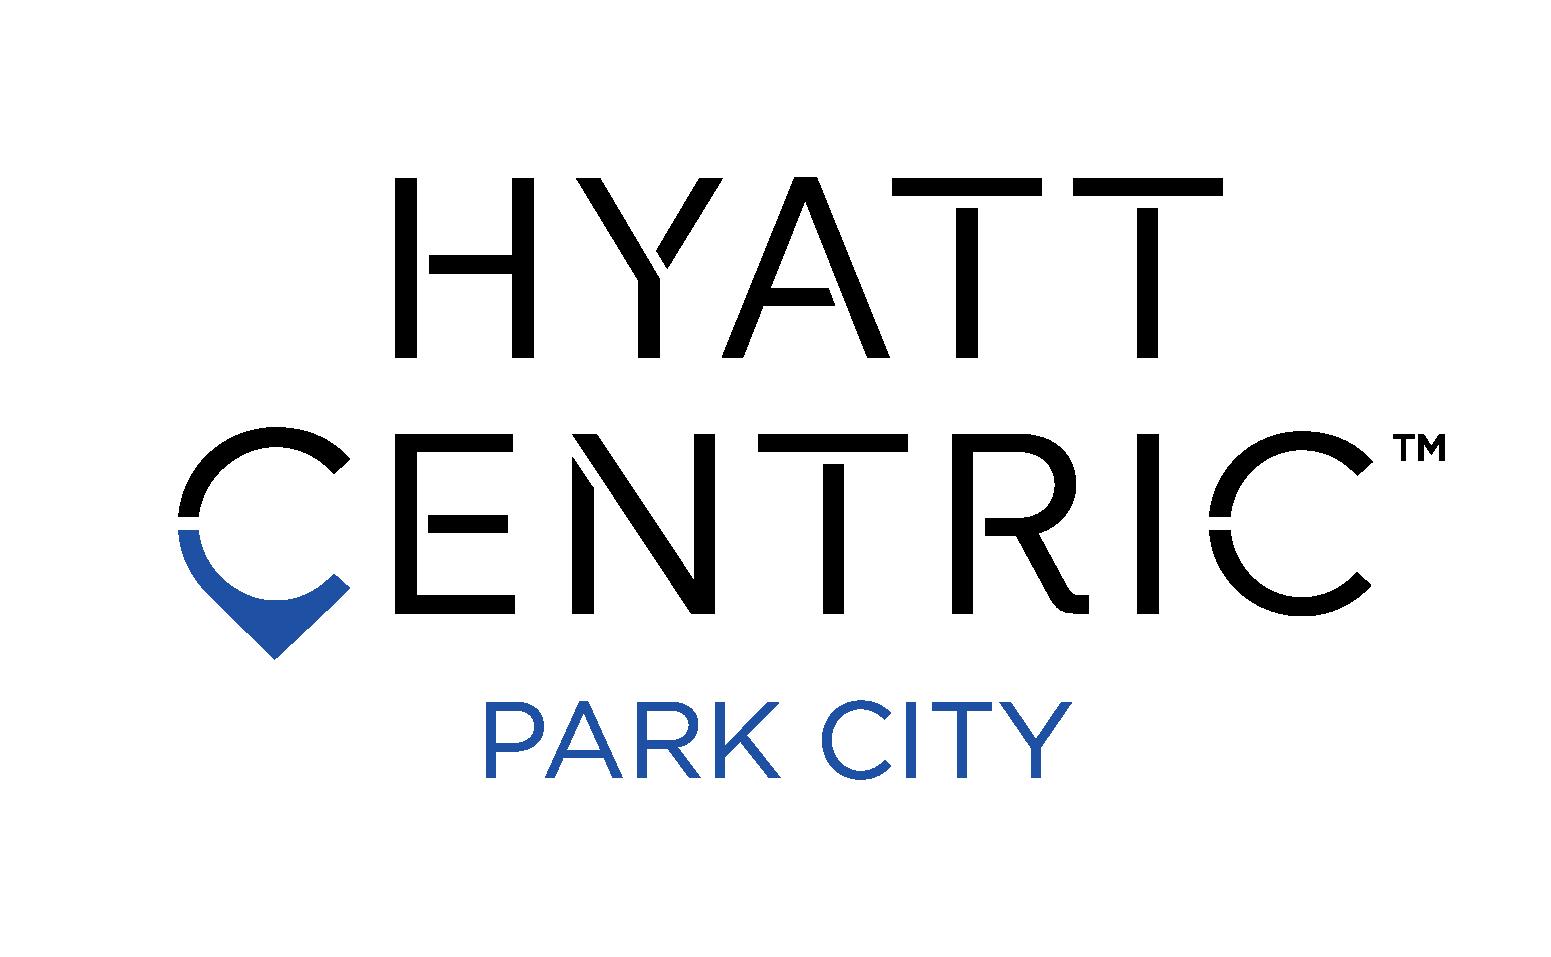 Hyatt Centric Park City Company Logo